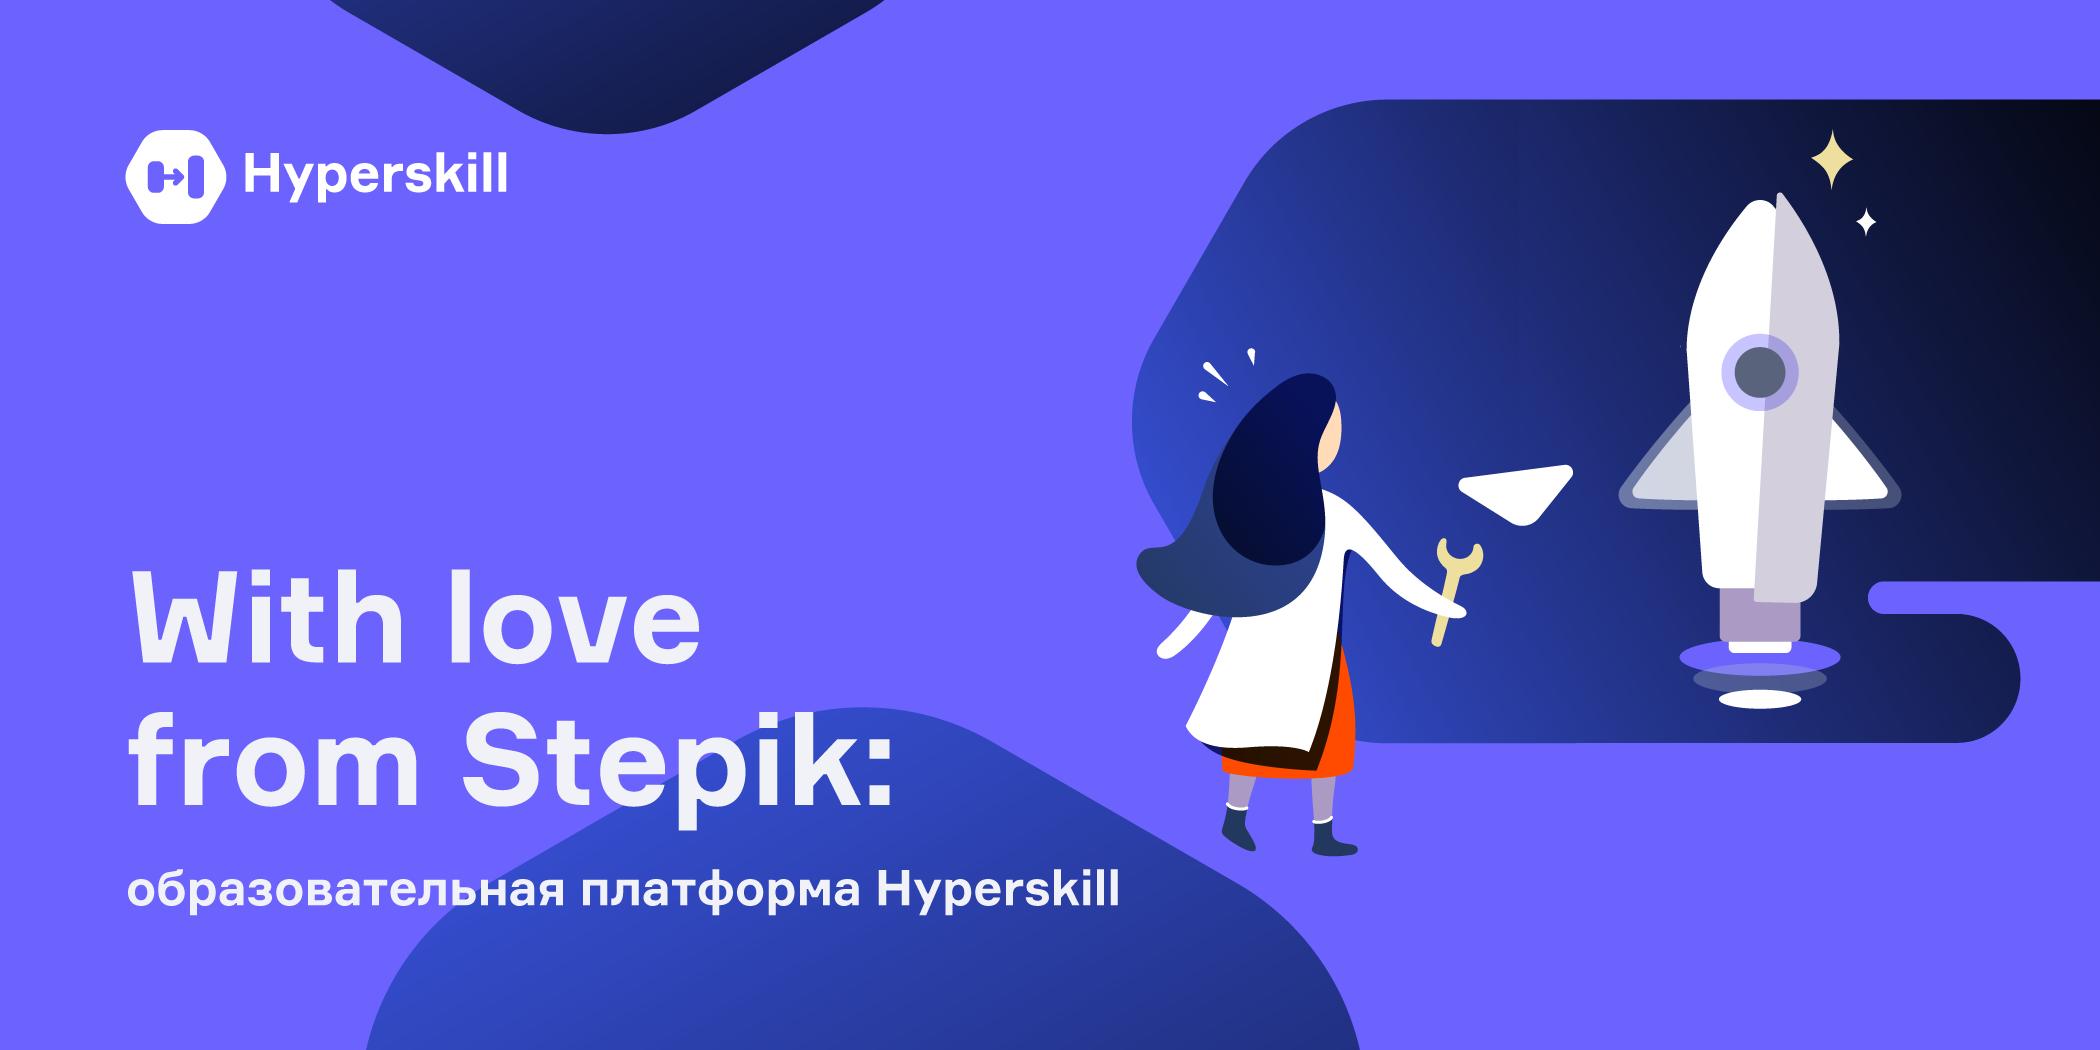 With love from Stepik: образовательная платформа Hyperskill